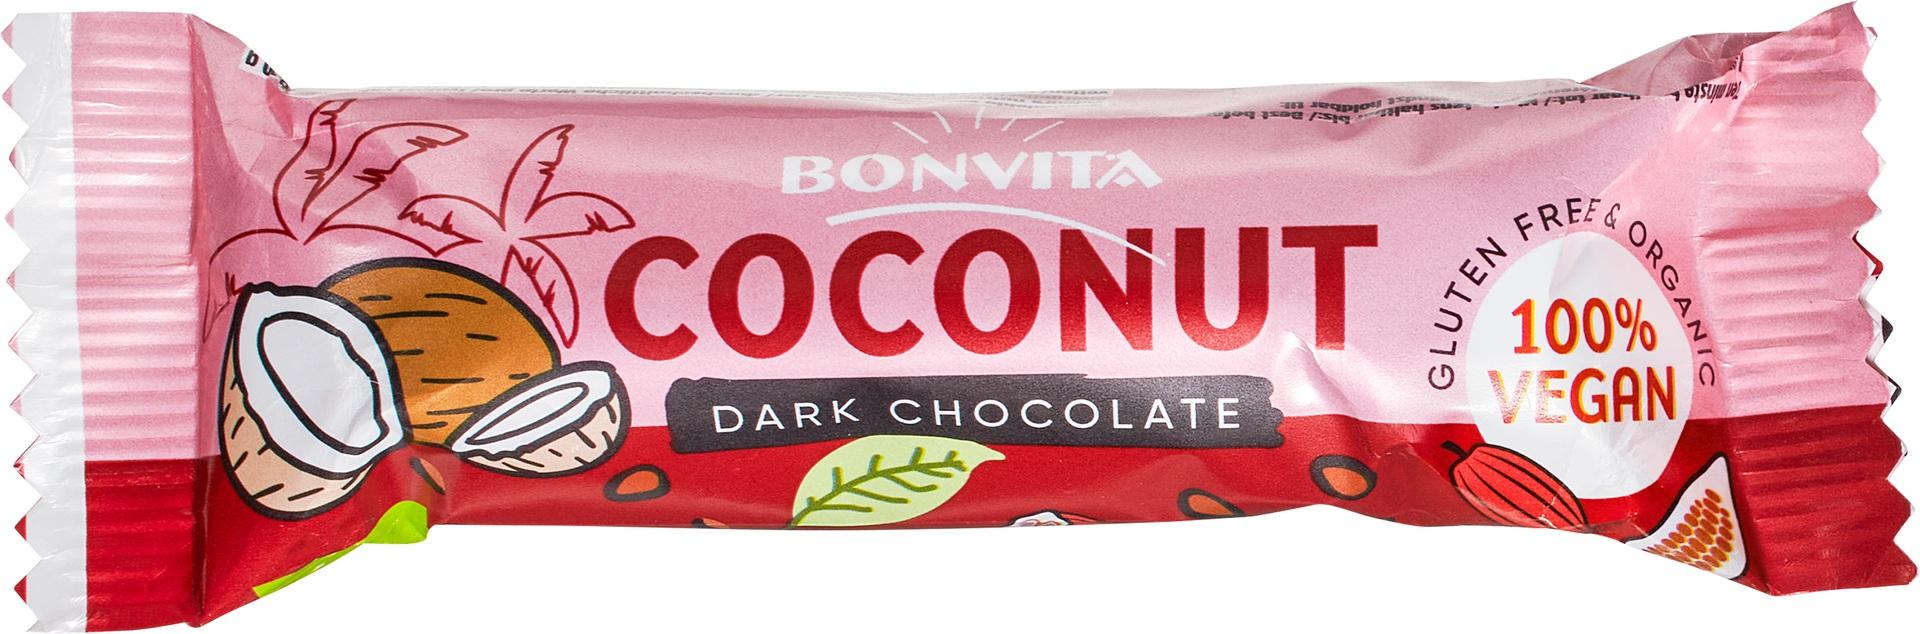 Biologische Bonvita Bonbarr pure chocolade - kokos 40 gr